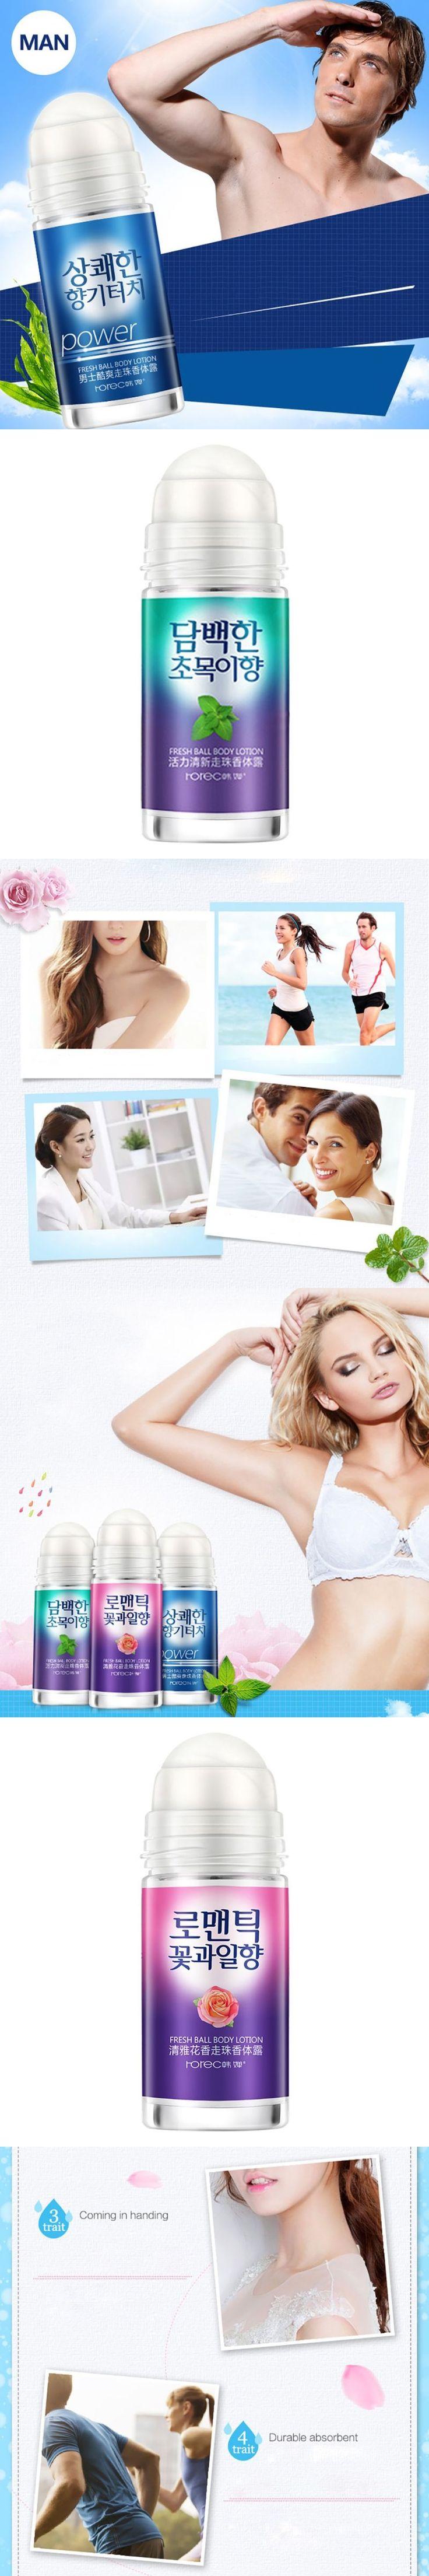 Hot Sale Summer Perfume Alum Stone Male Deodorants Solid Natural Crystal Deodorant Antiperspirant